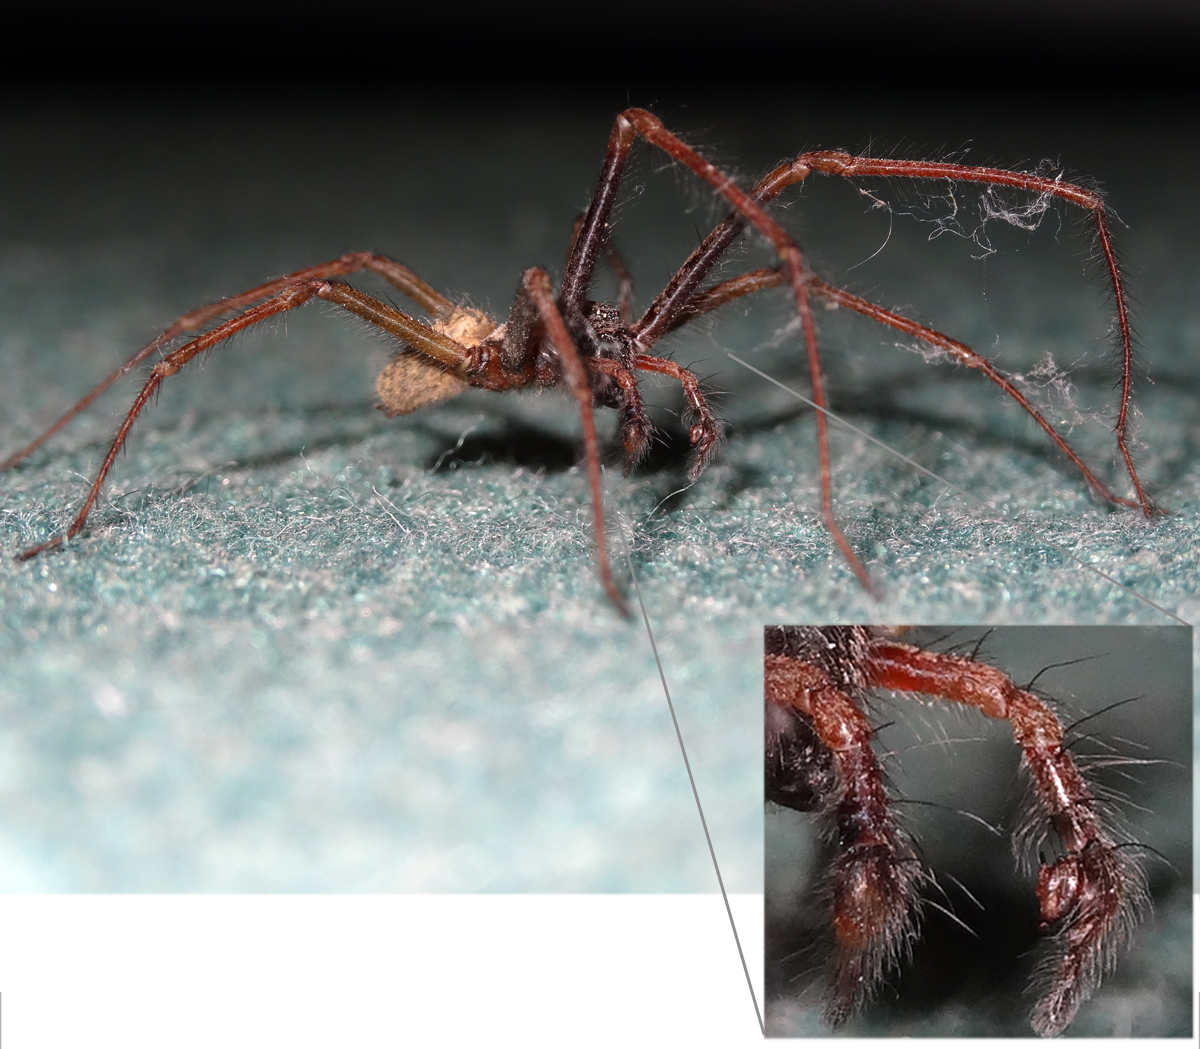 Common house spider bite